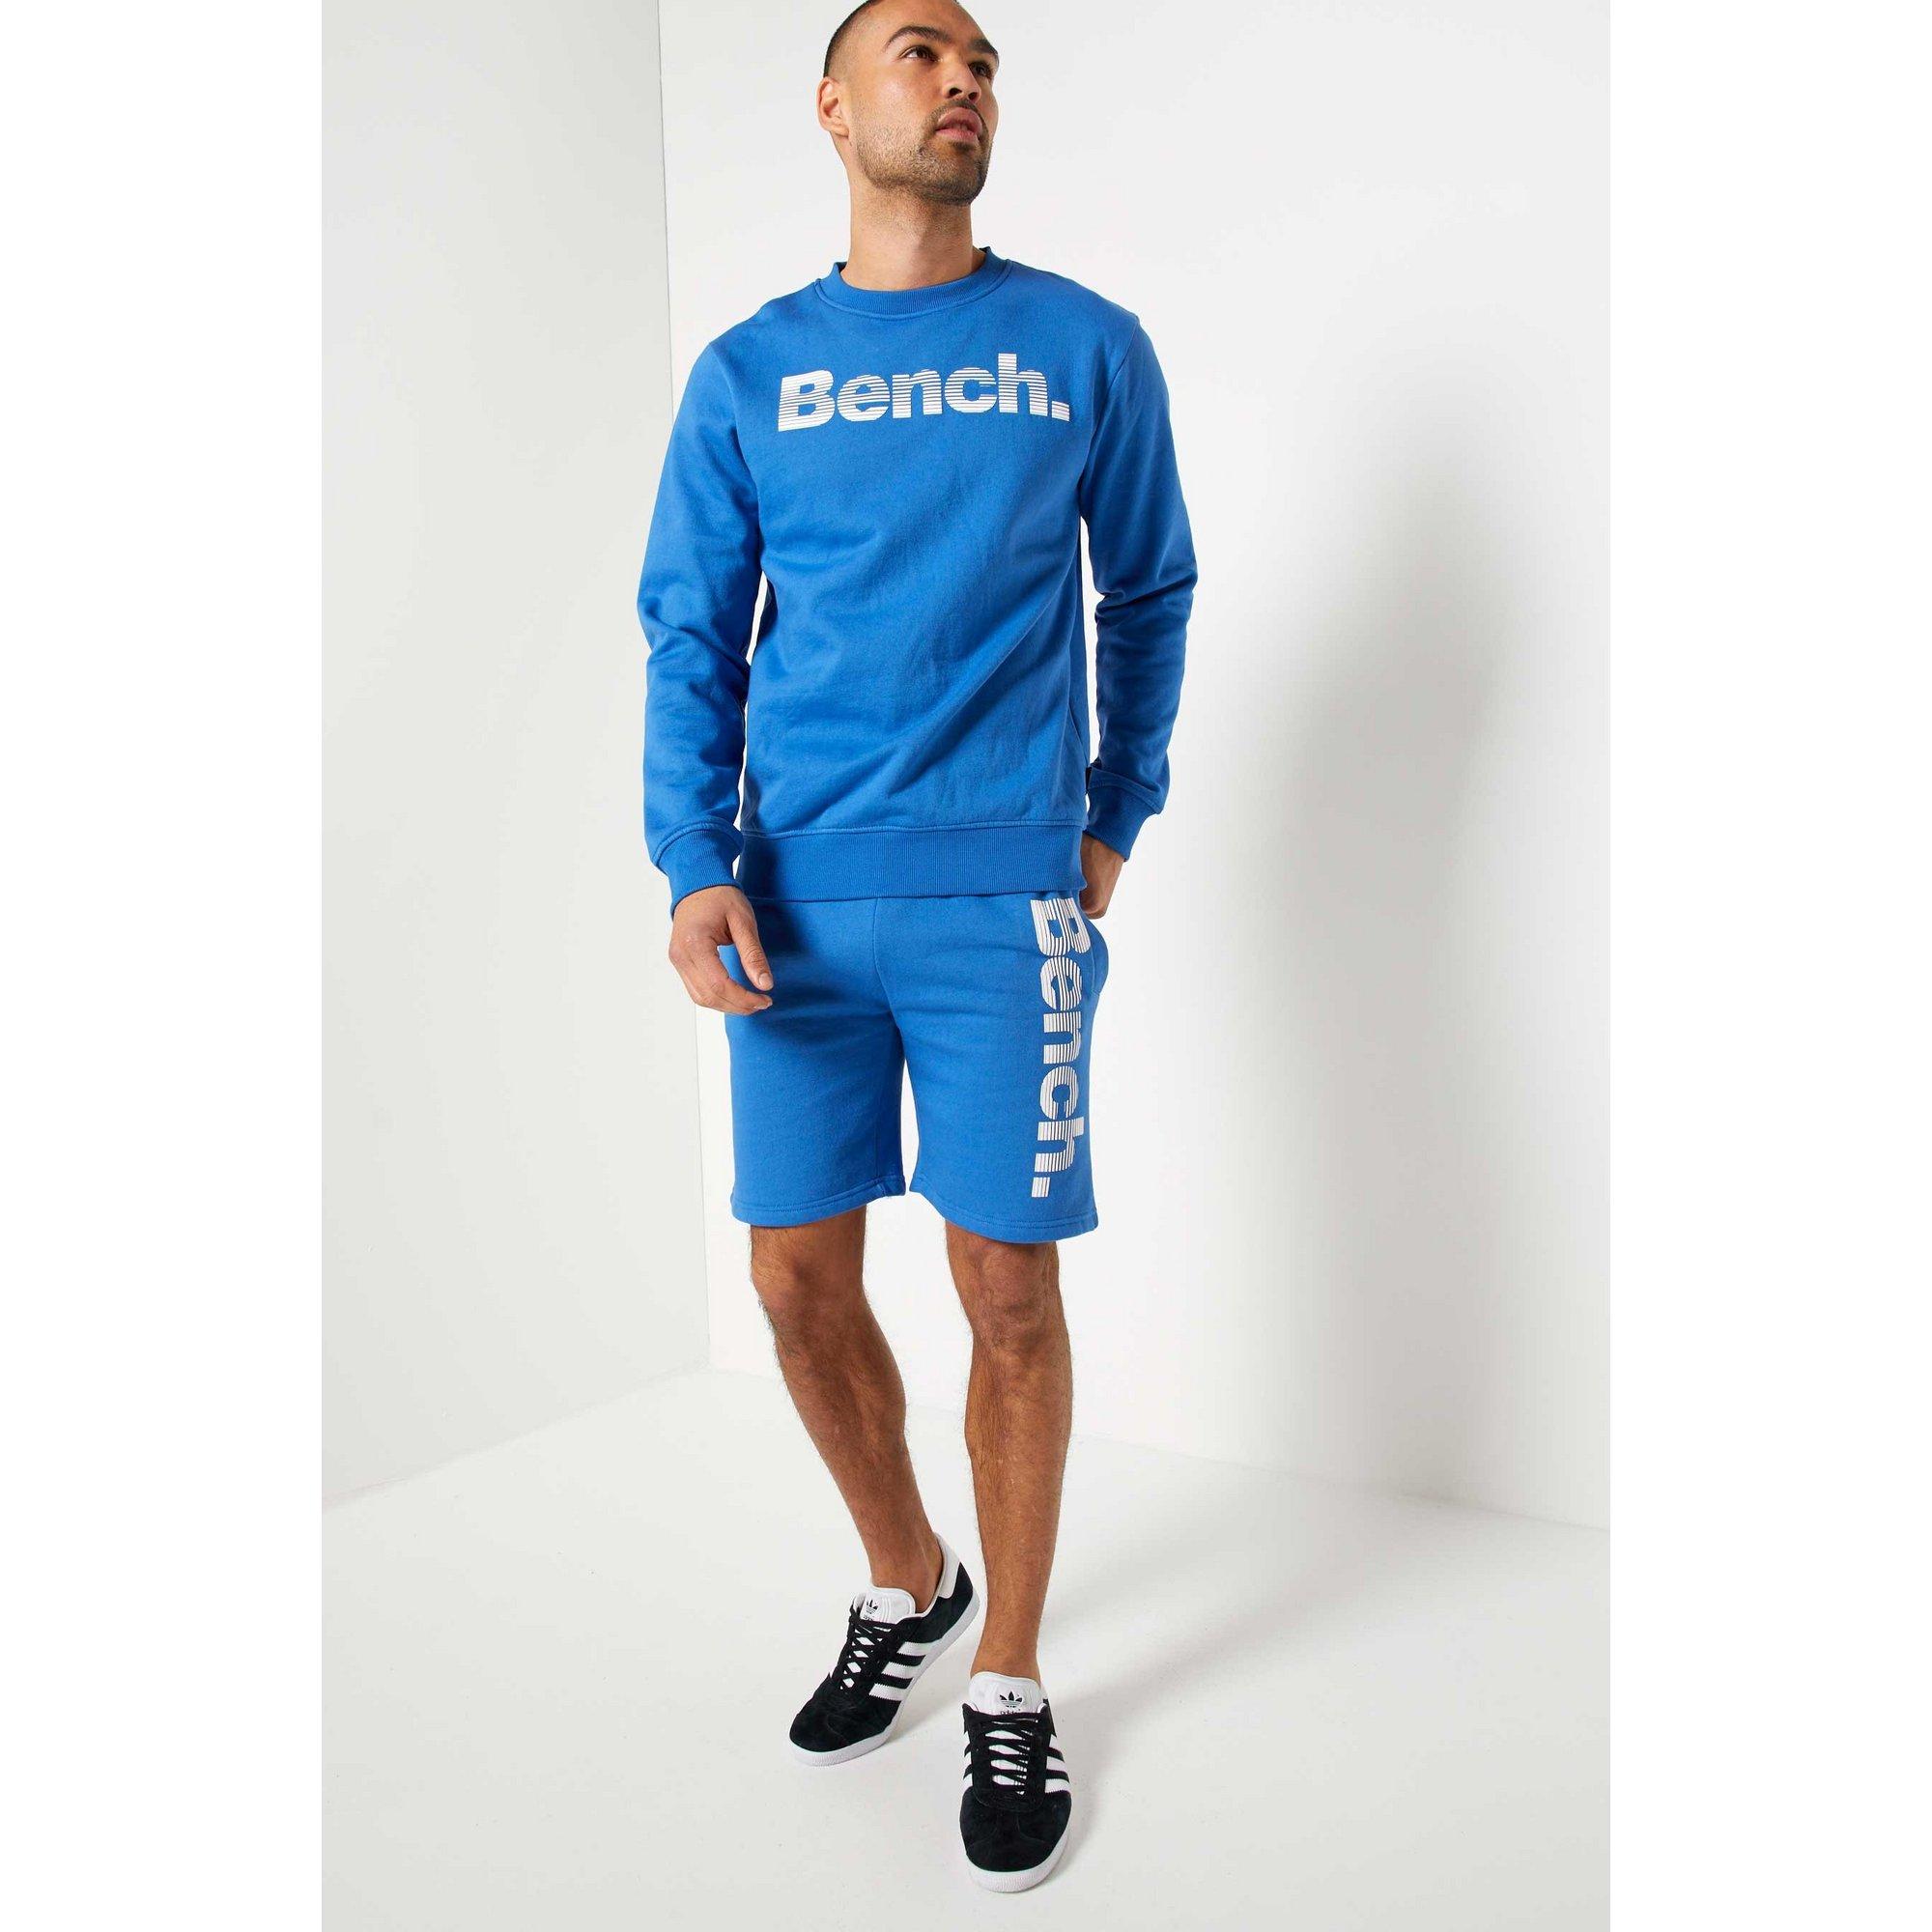 Image of Bench Blue Crew Neck Sweatshirt and Short Set